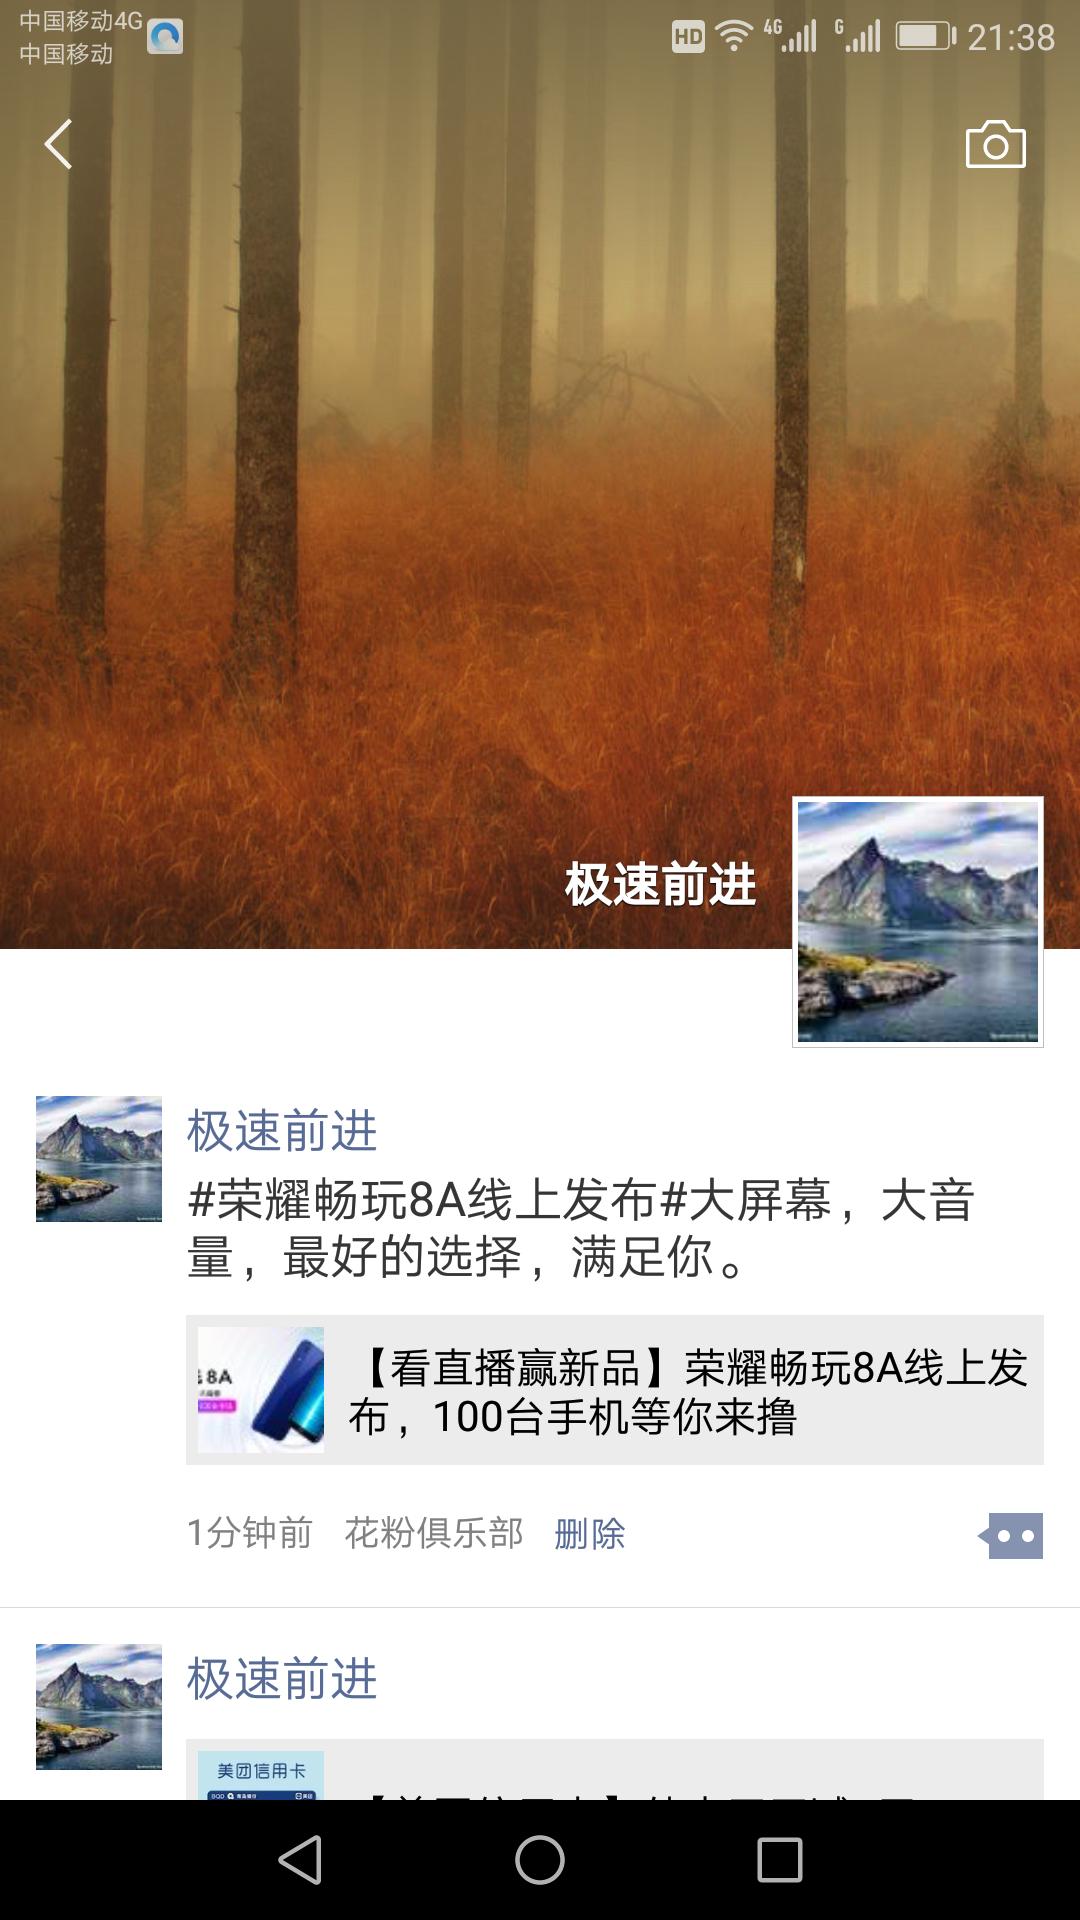 Screenshot_20190108-213830.png